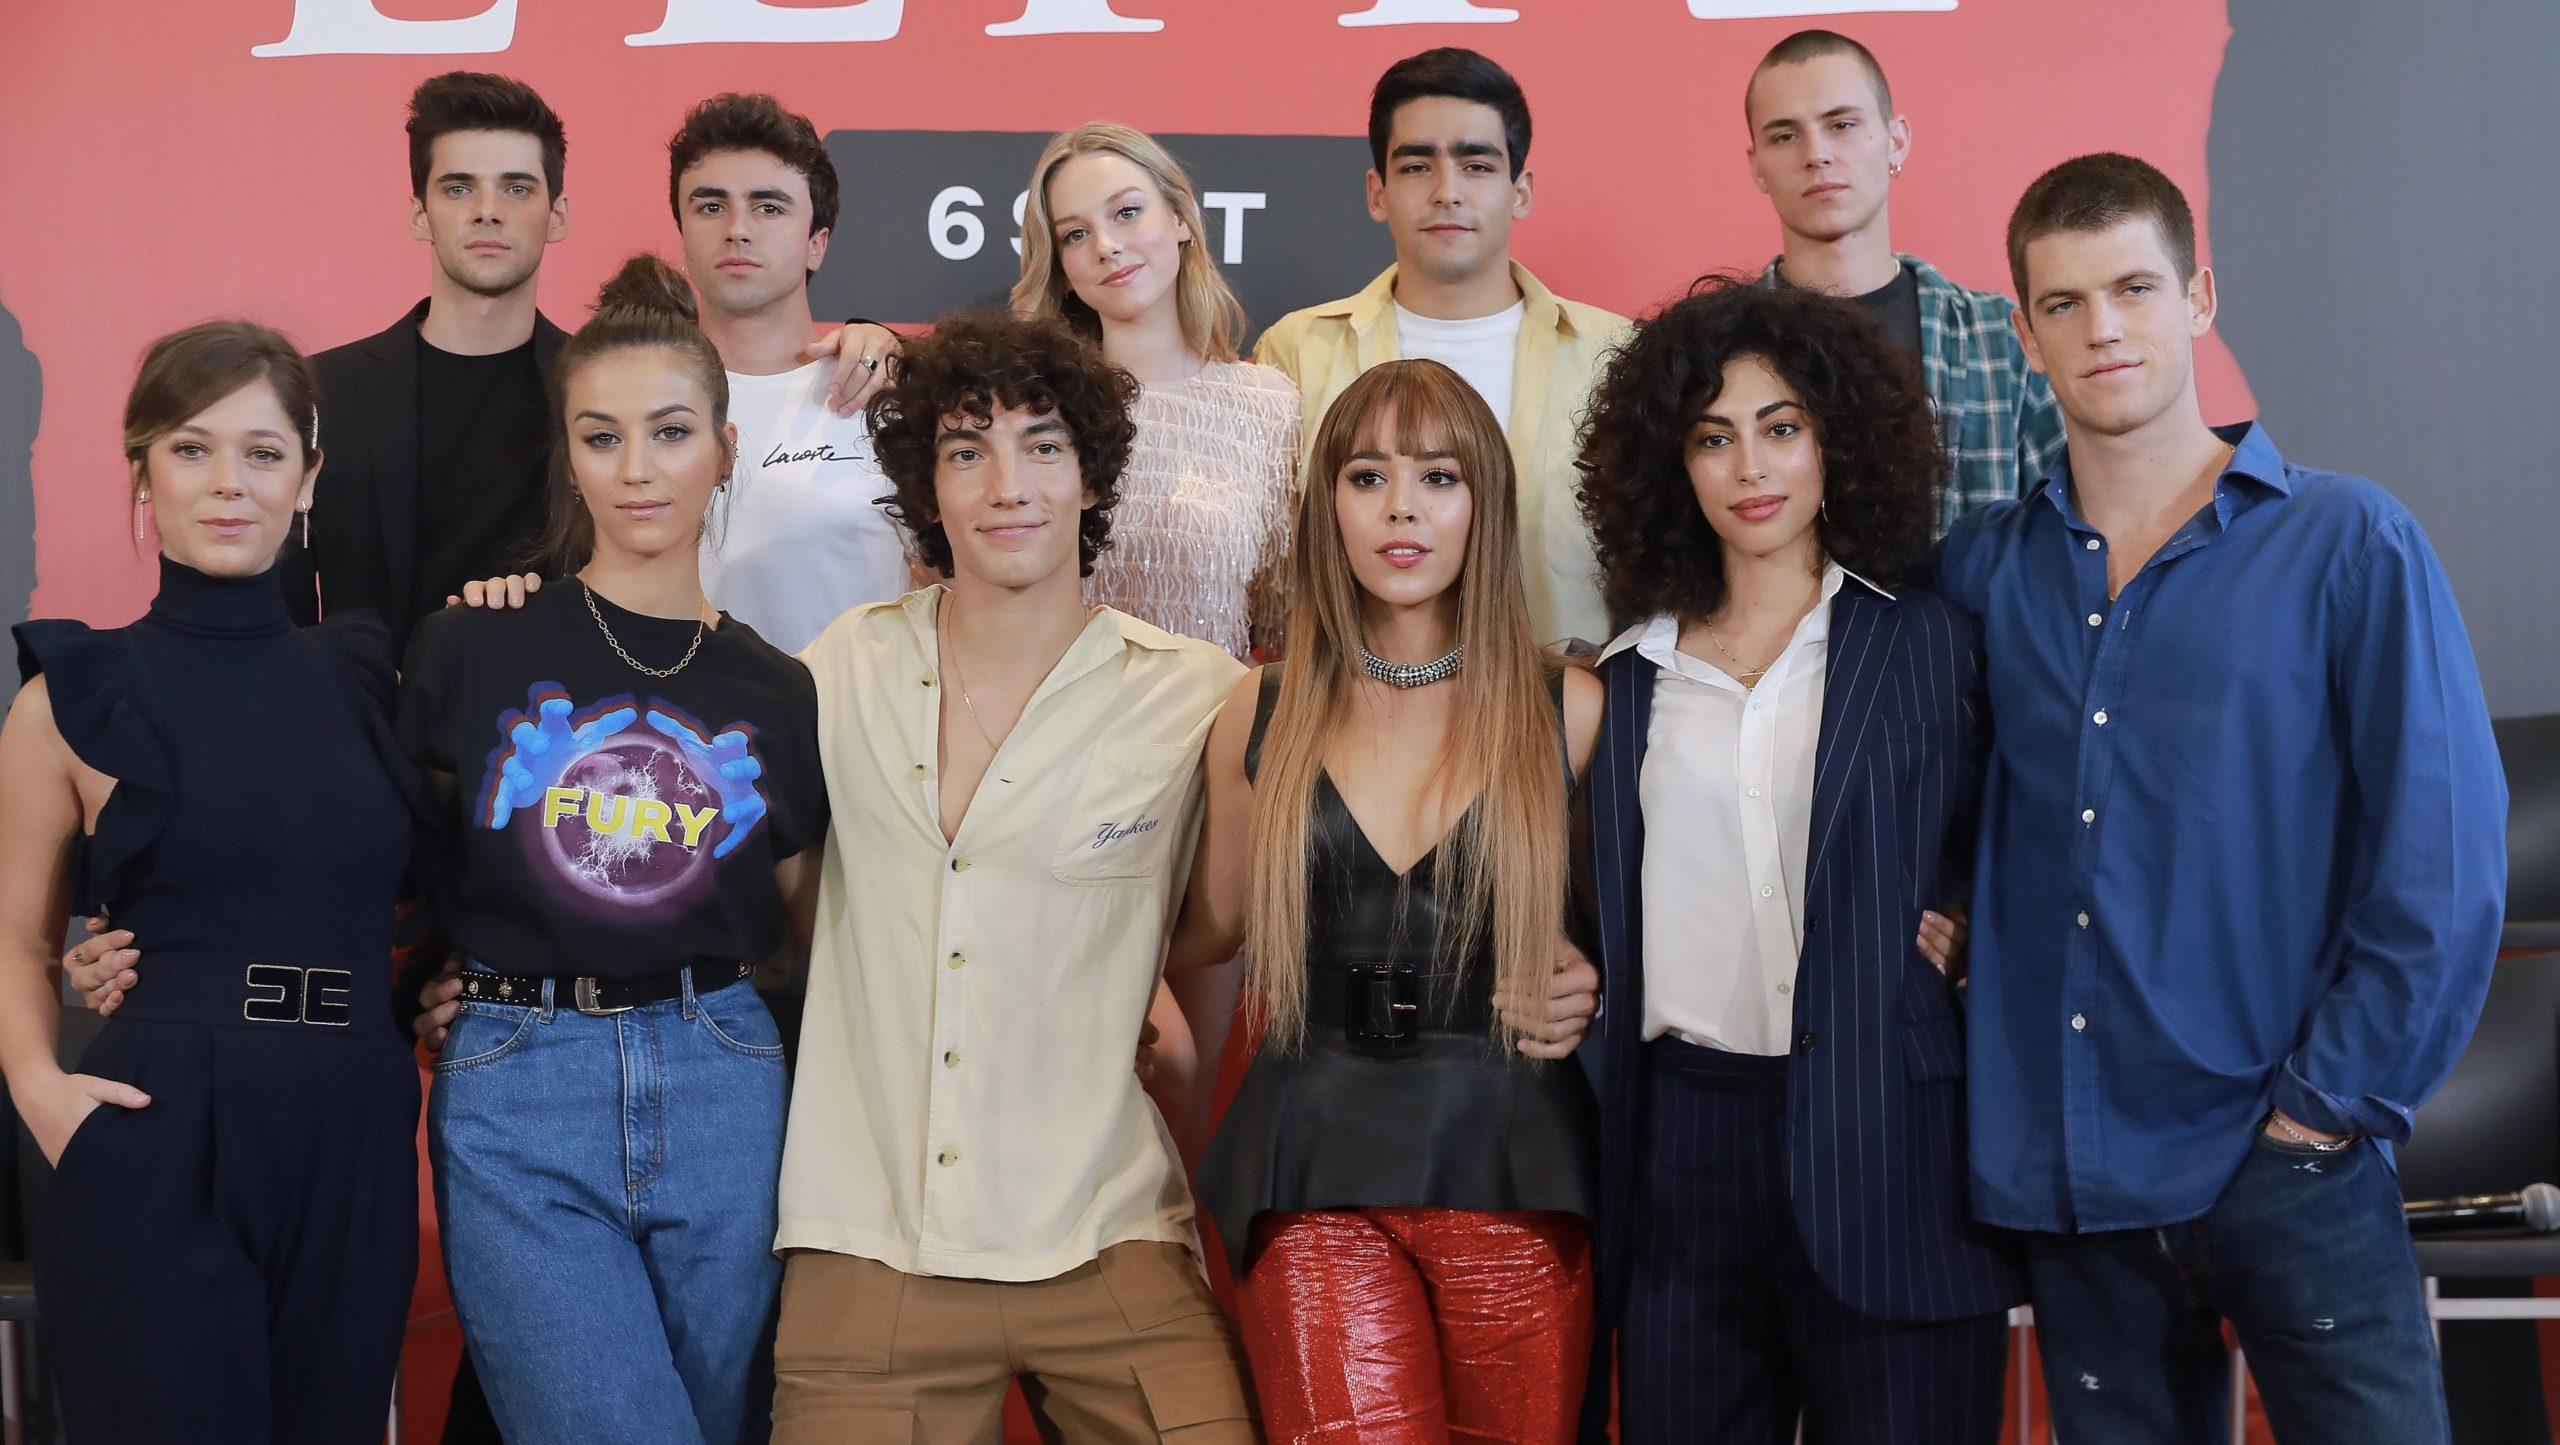 Elite Season 5 Release Date : When will the Spanish Teen Drama Return to Netflix?